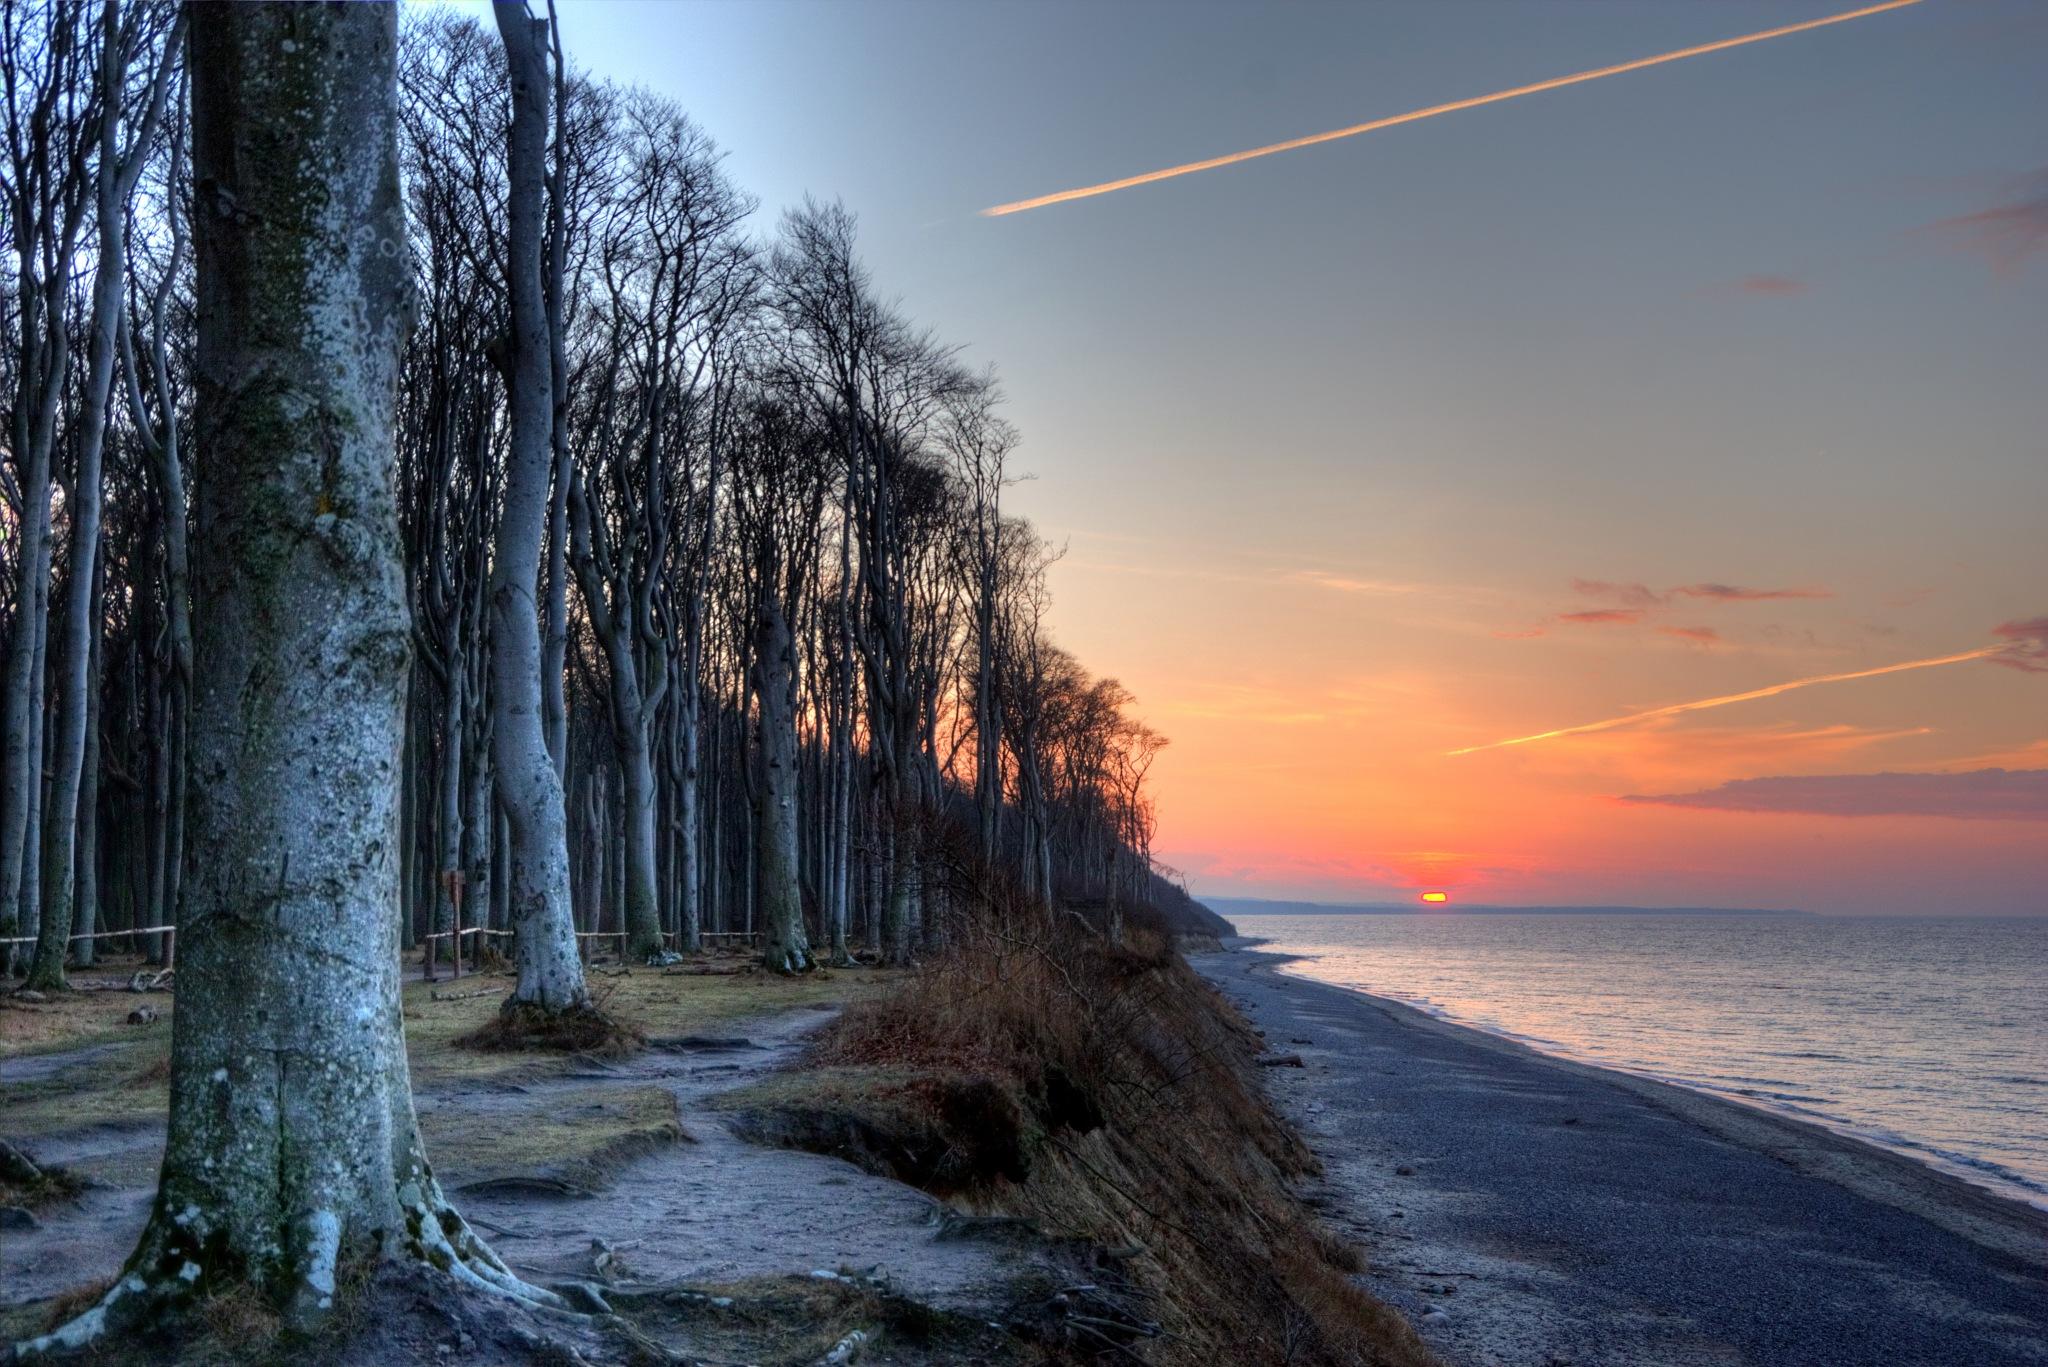 Gespensterwald Nienhagen Baltic Sea by diplompunk